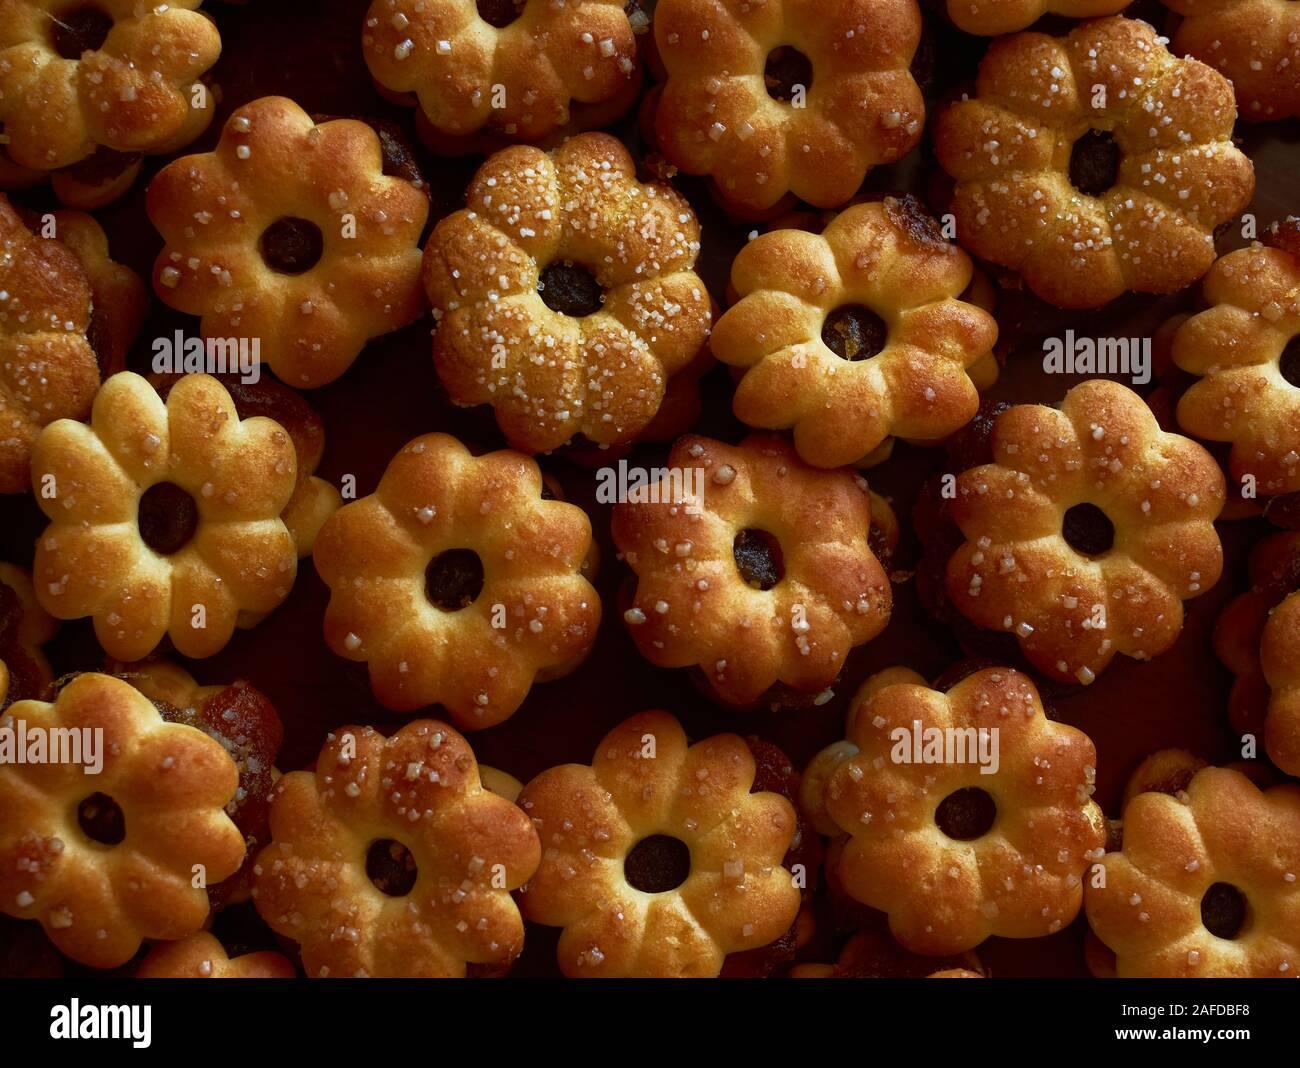 Hintergrund sweet Keks mit Ananas Konfitüre Stockfoto